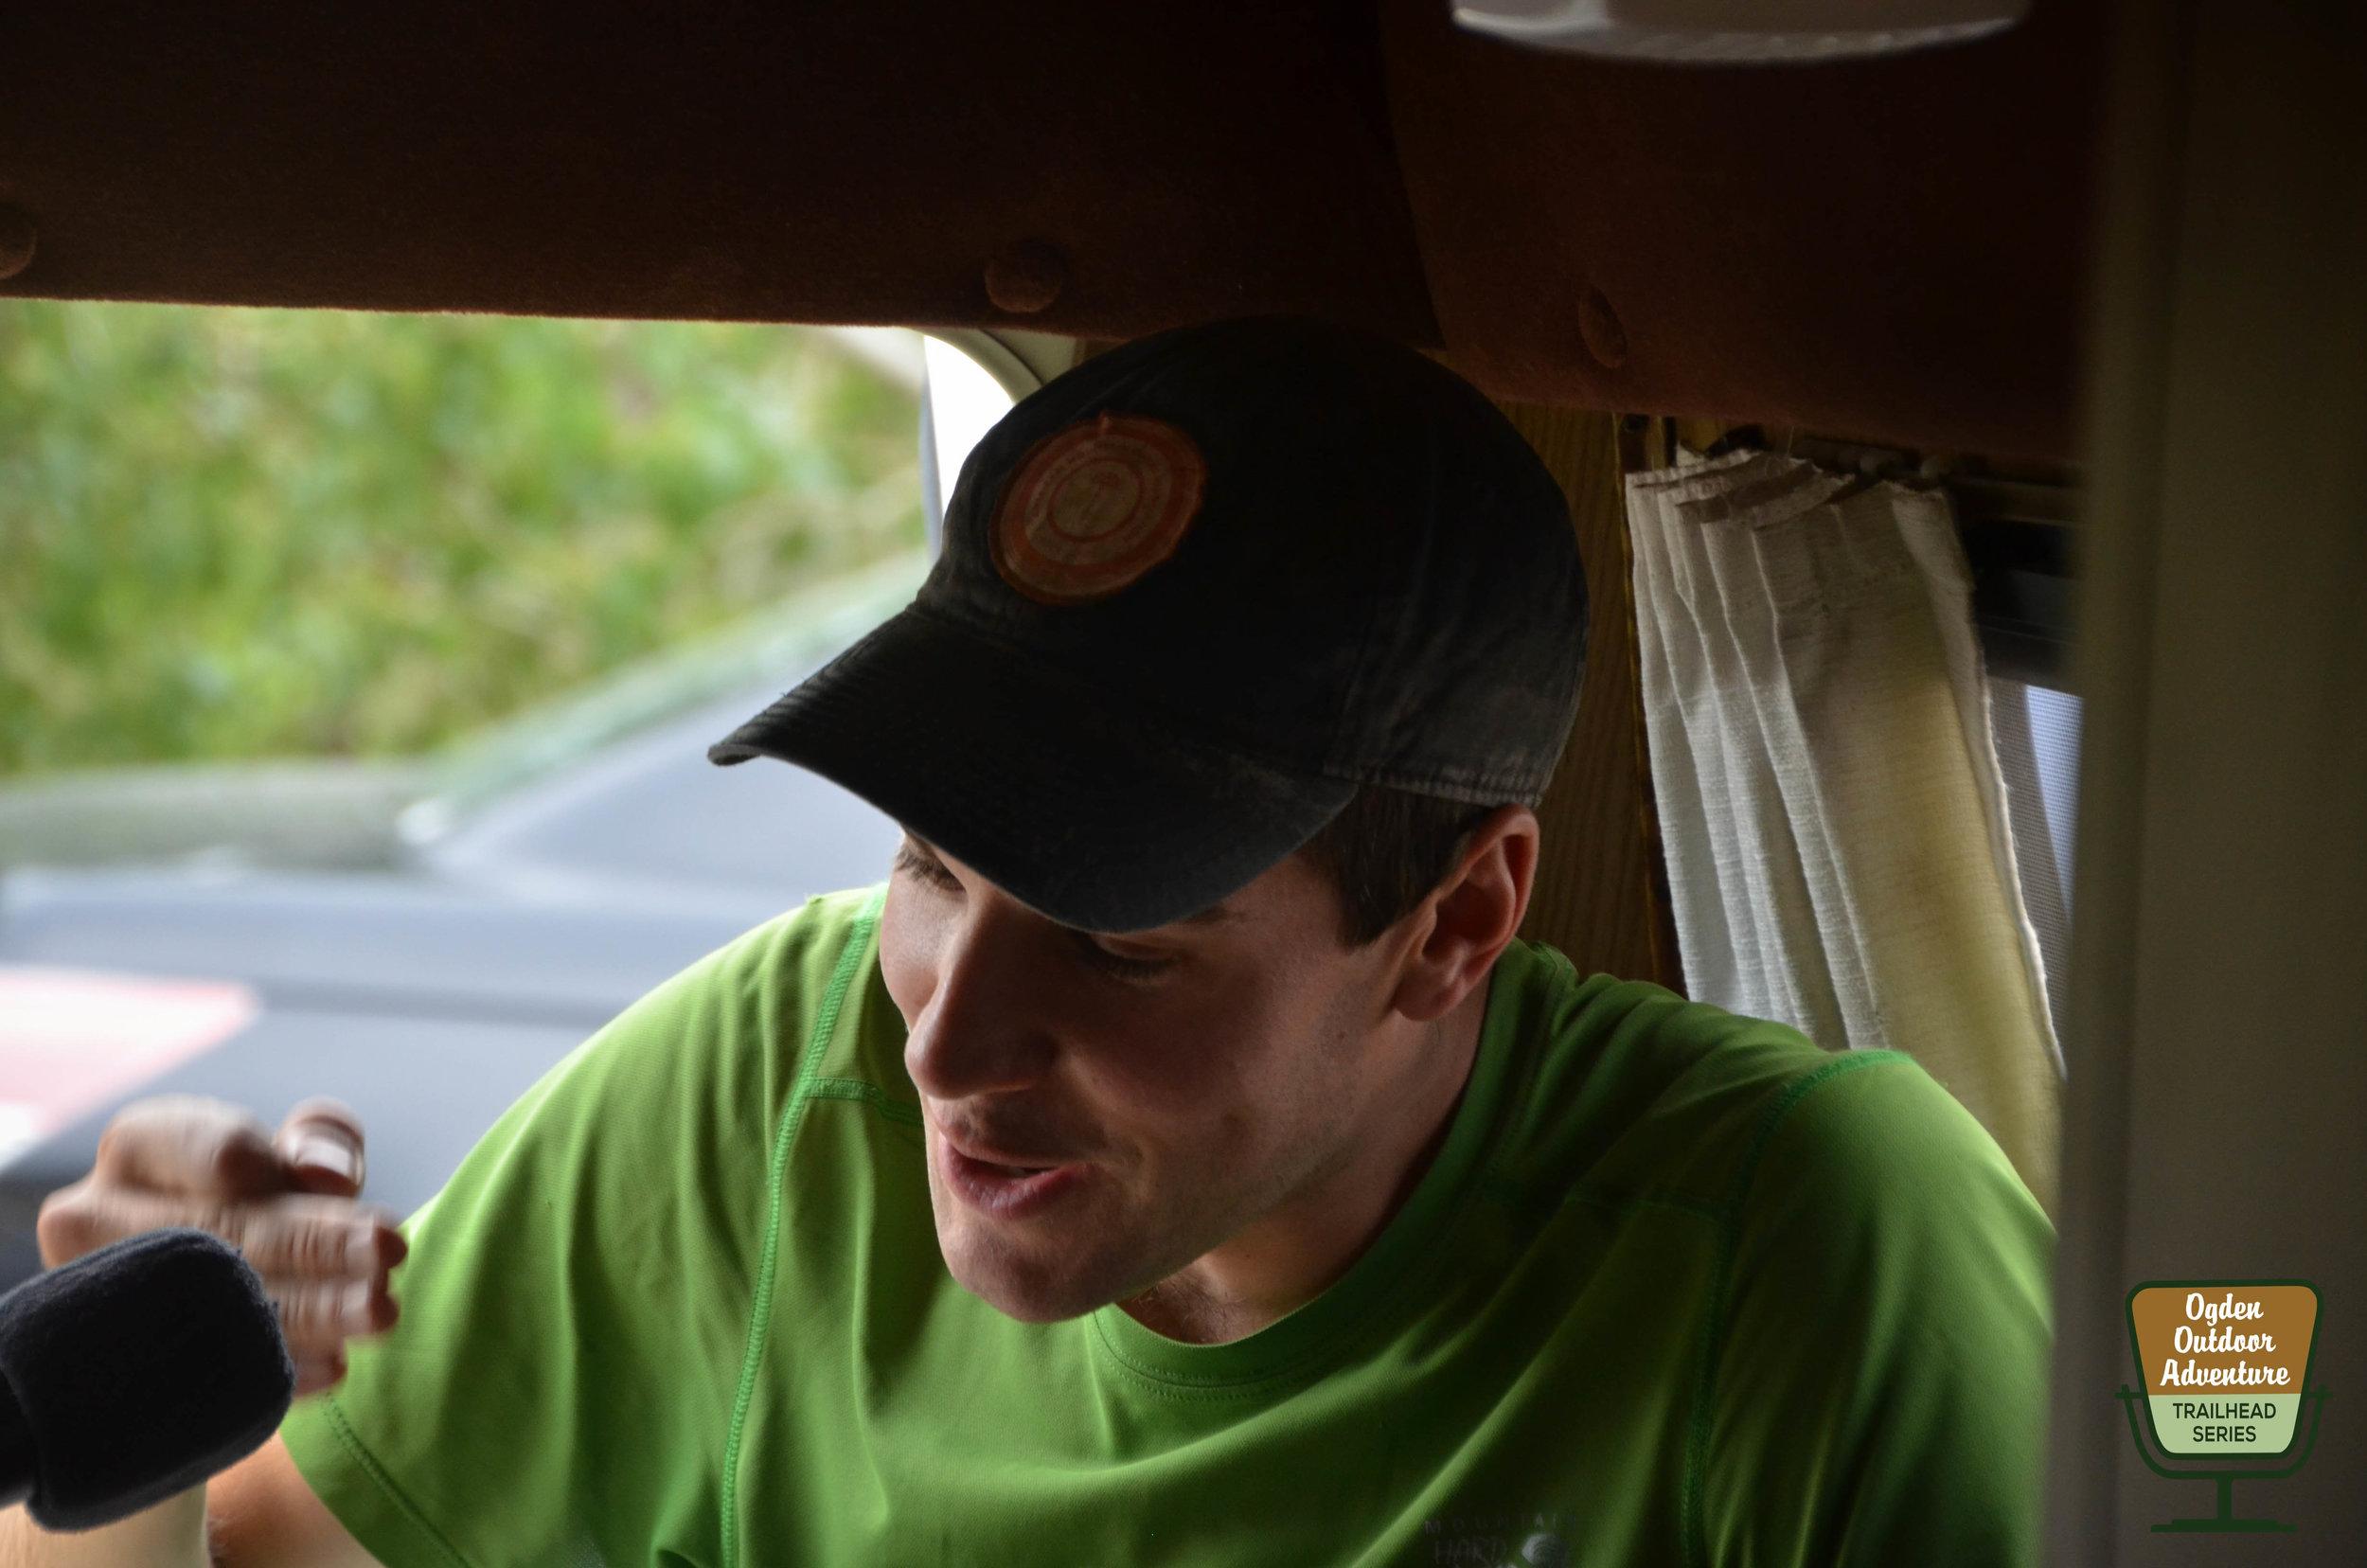 Ogden Outdoor Adventure Show 248 - Bear House Mountaineering-27.jpg